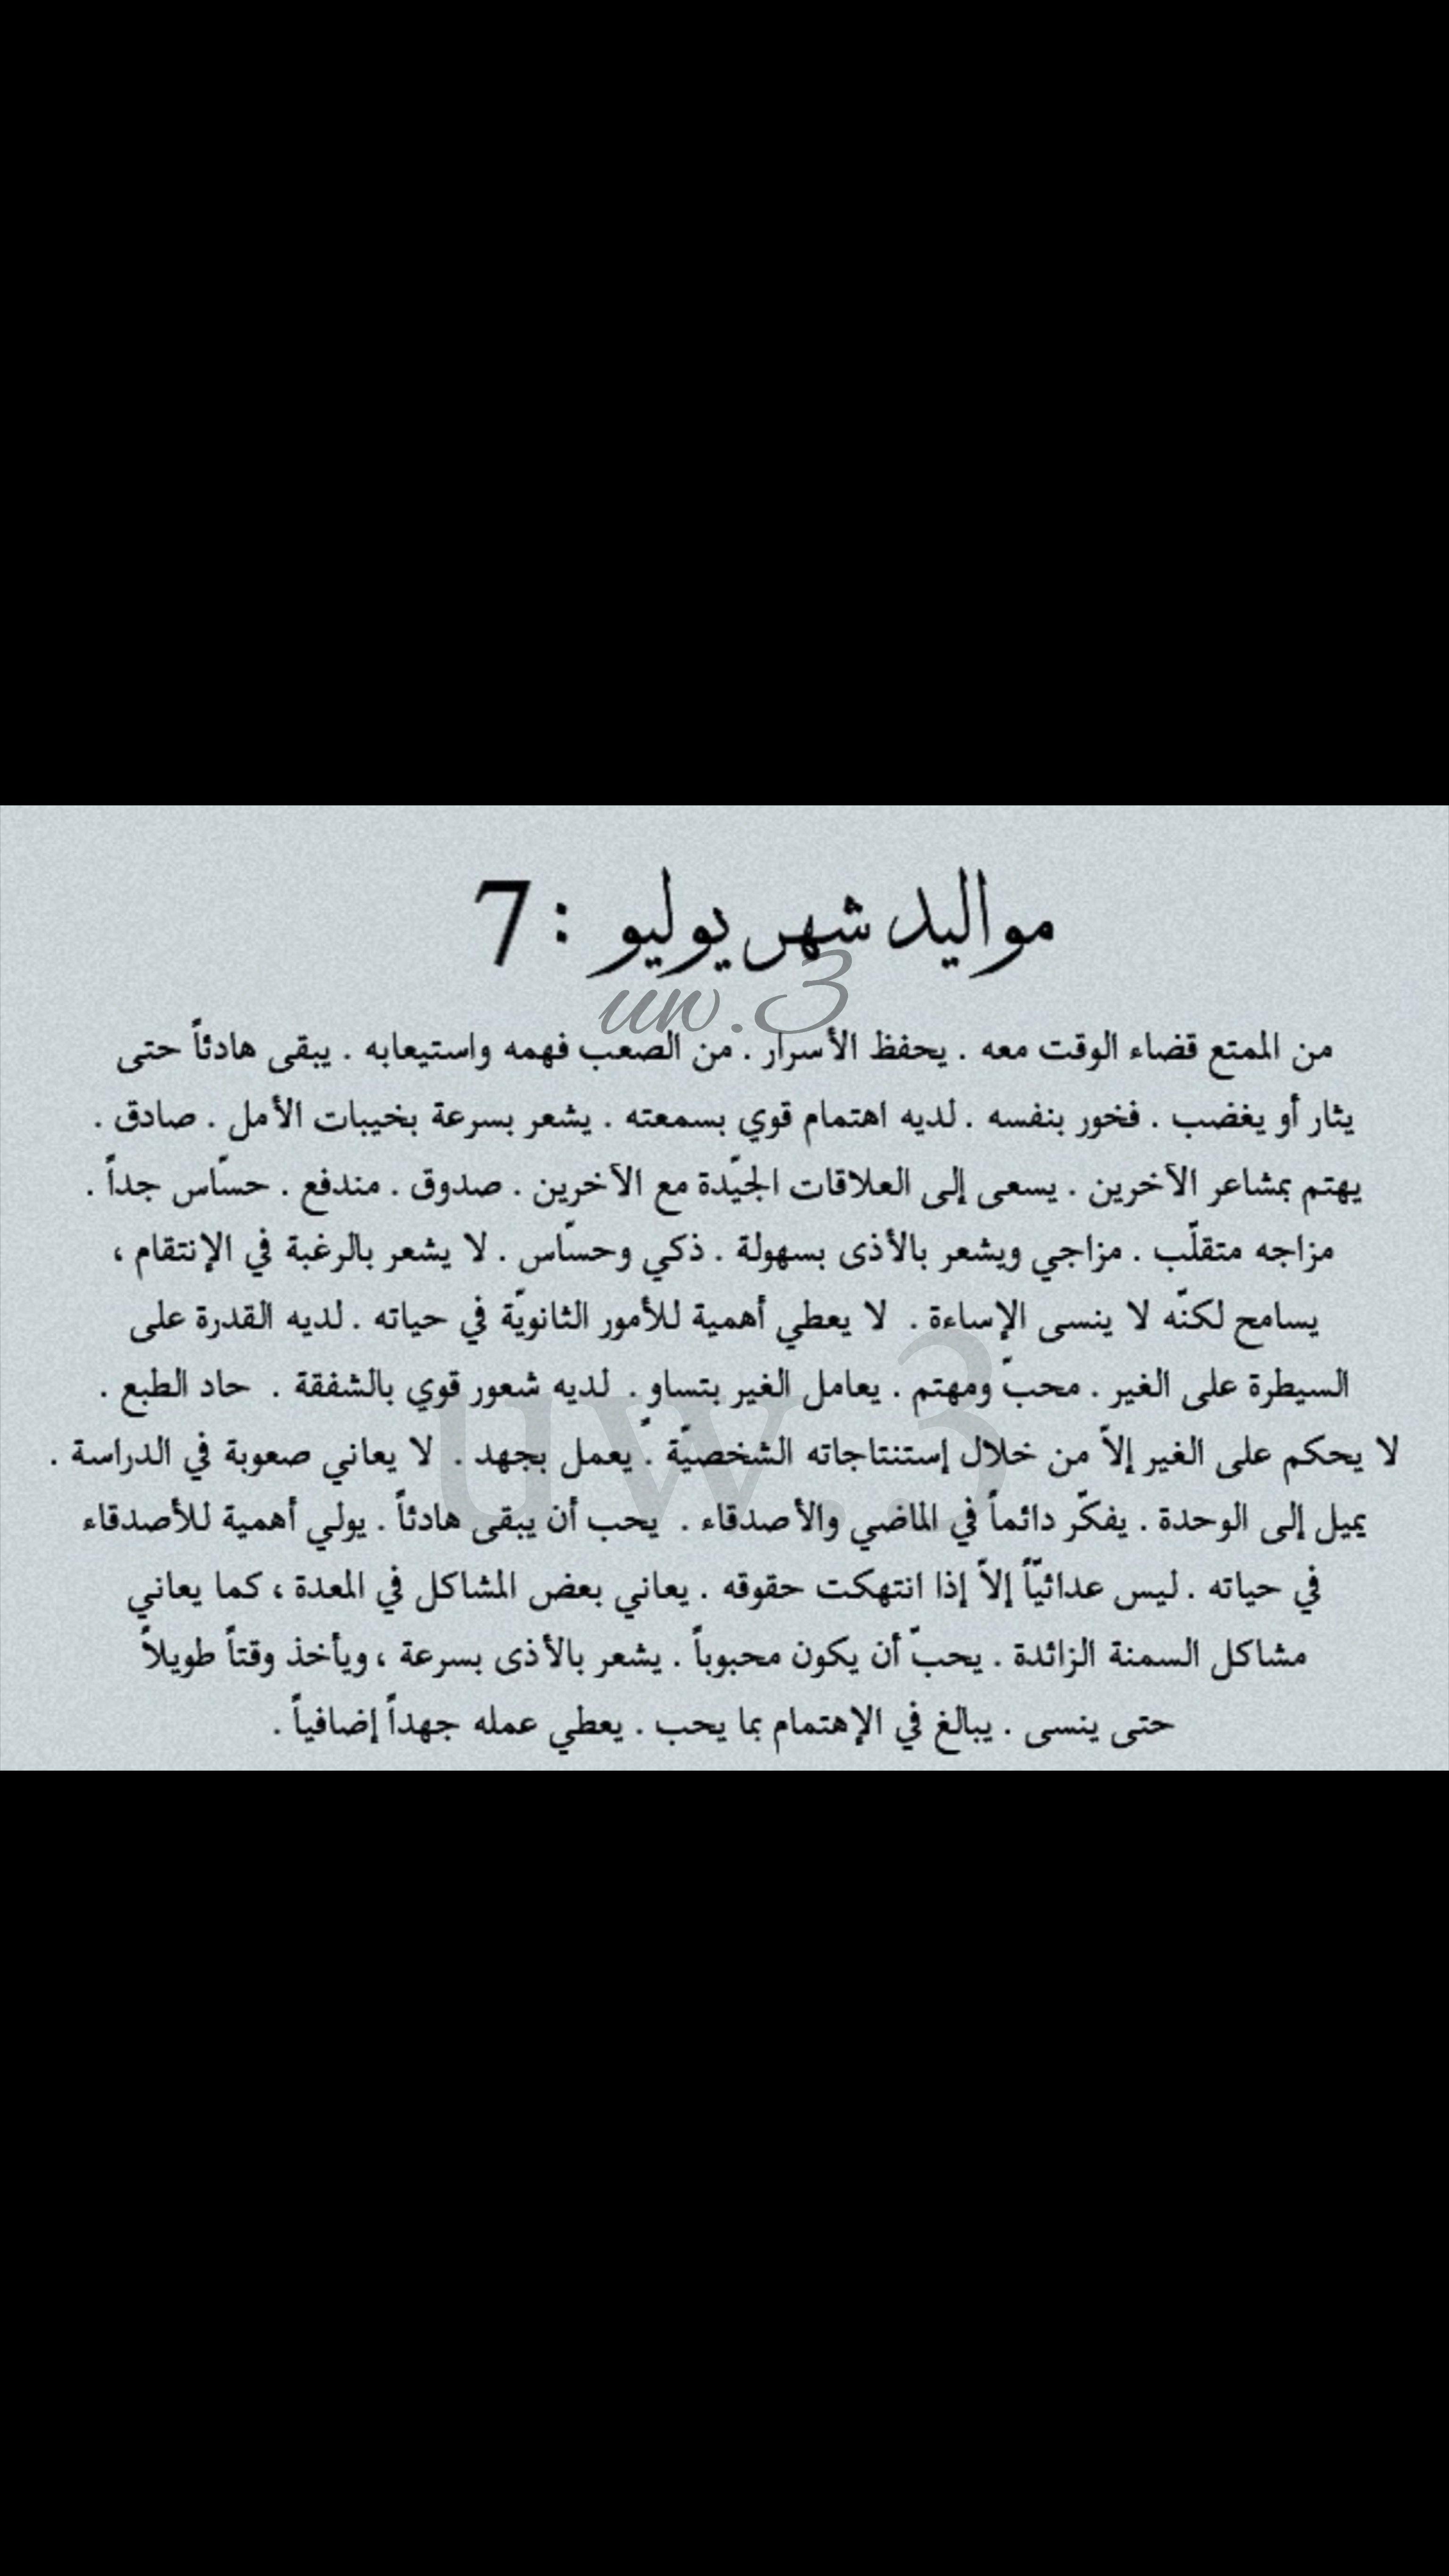 Pin By As On 彡 ℳℐxℰⅅ 彡 Words Quotes Quotes Arabic Quotes